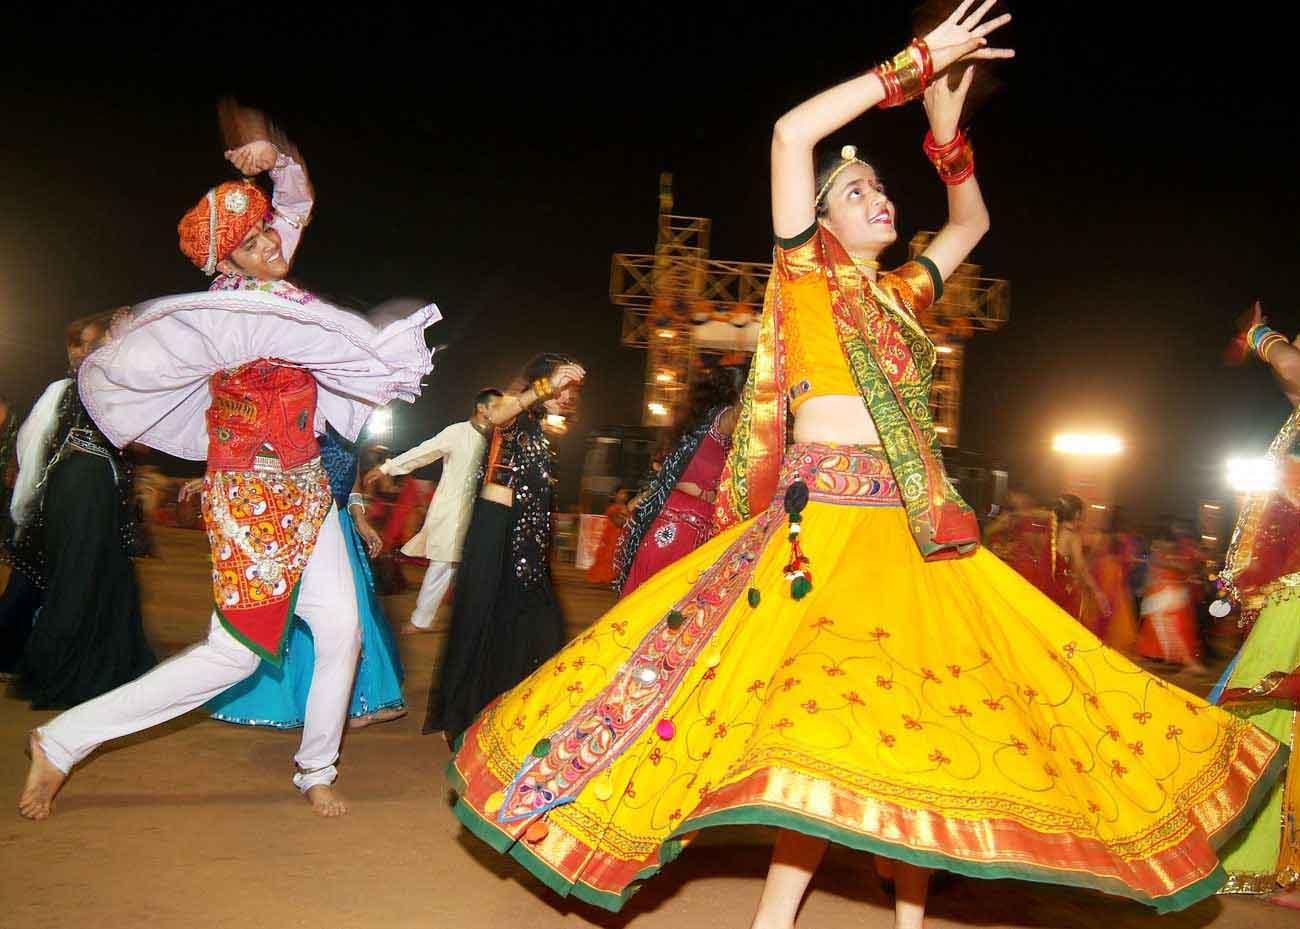 Bhil Lady Dancing during a Bhil Community Festival